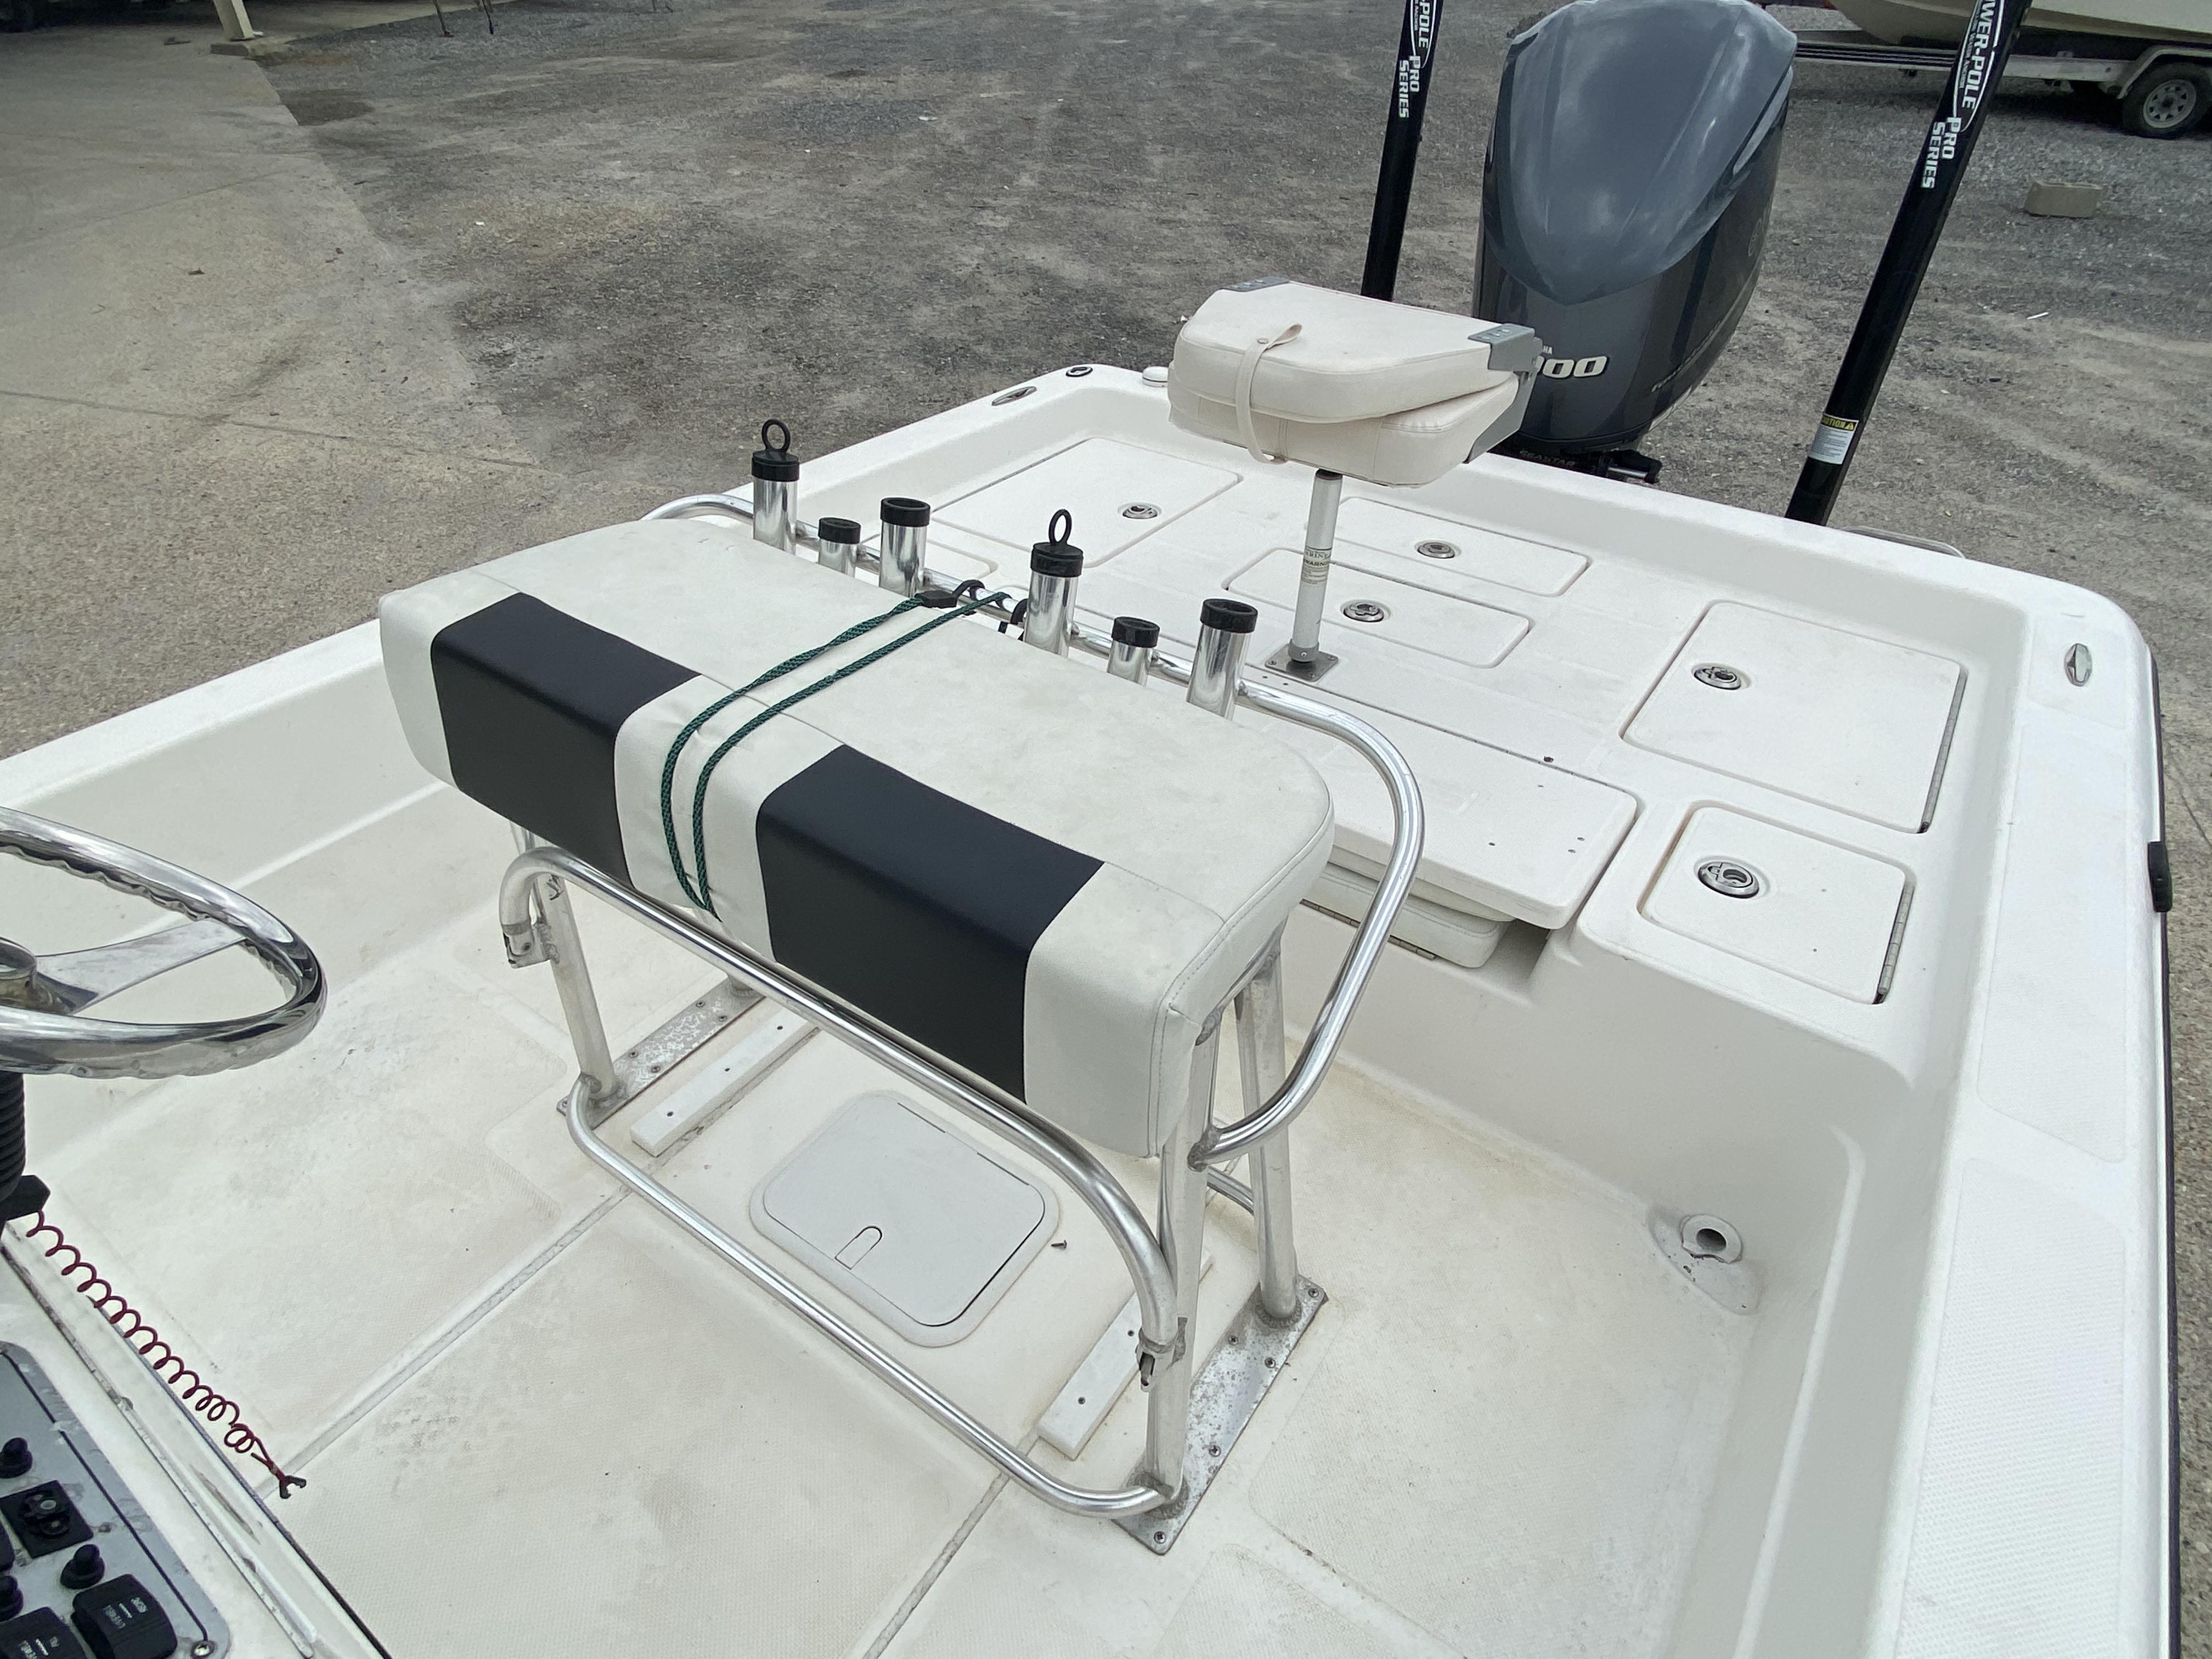 2010 Skeeter boat for sale, model of the boat is ZX 24V & Image # 4 of 18